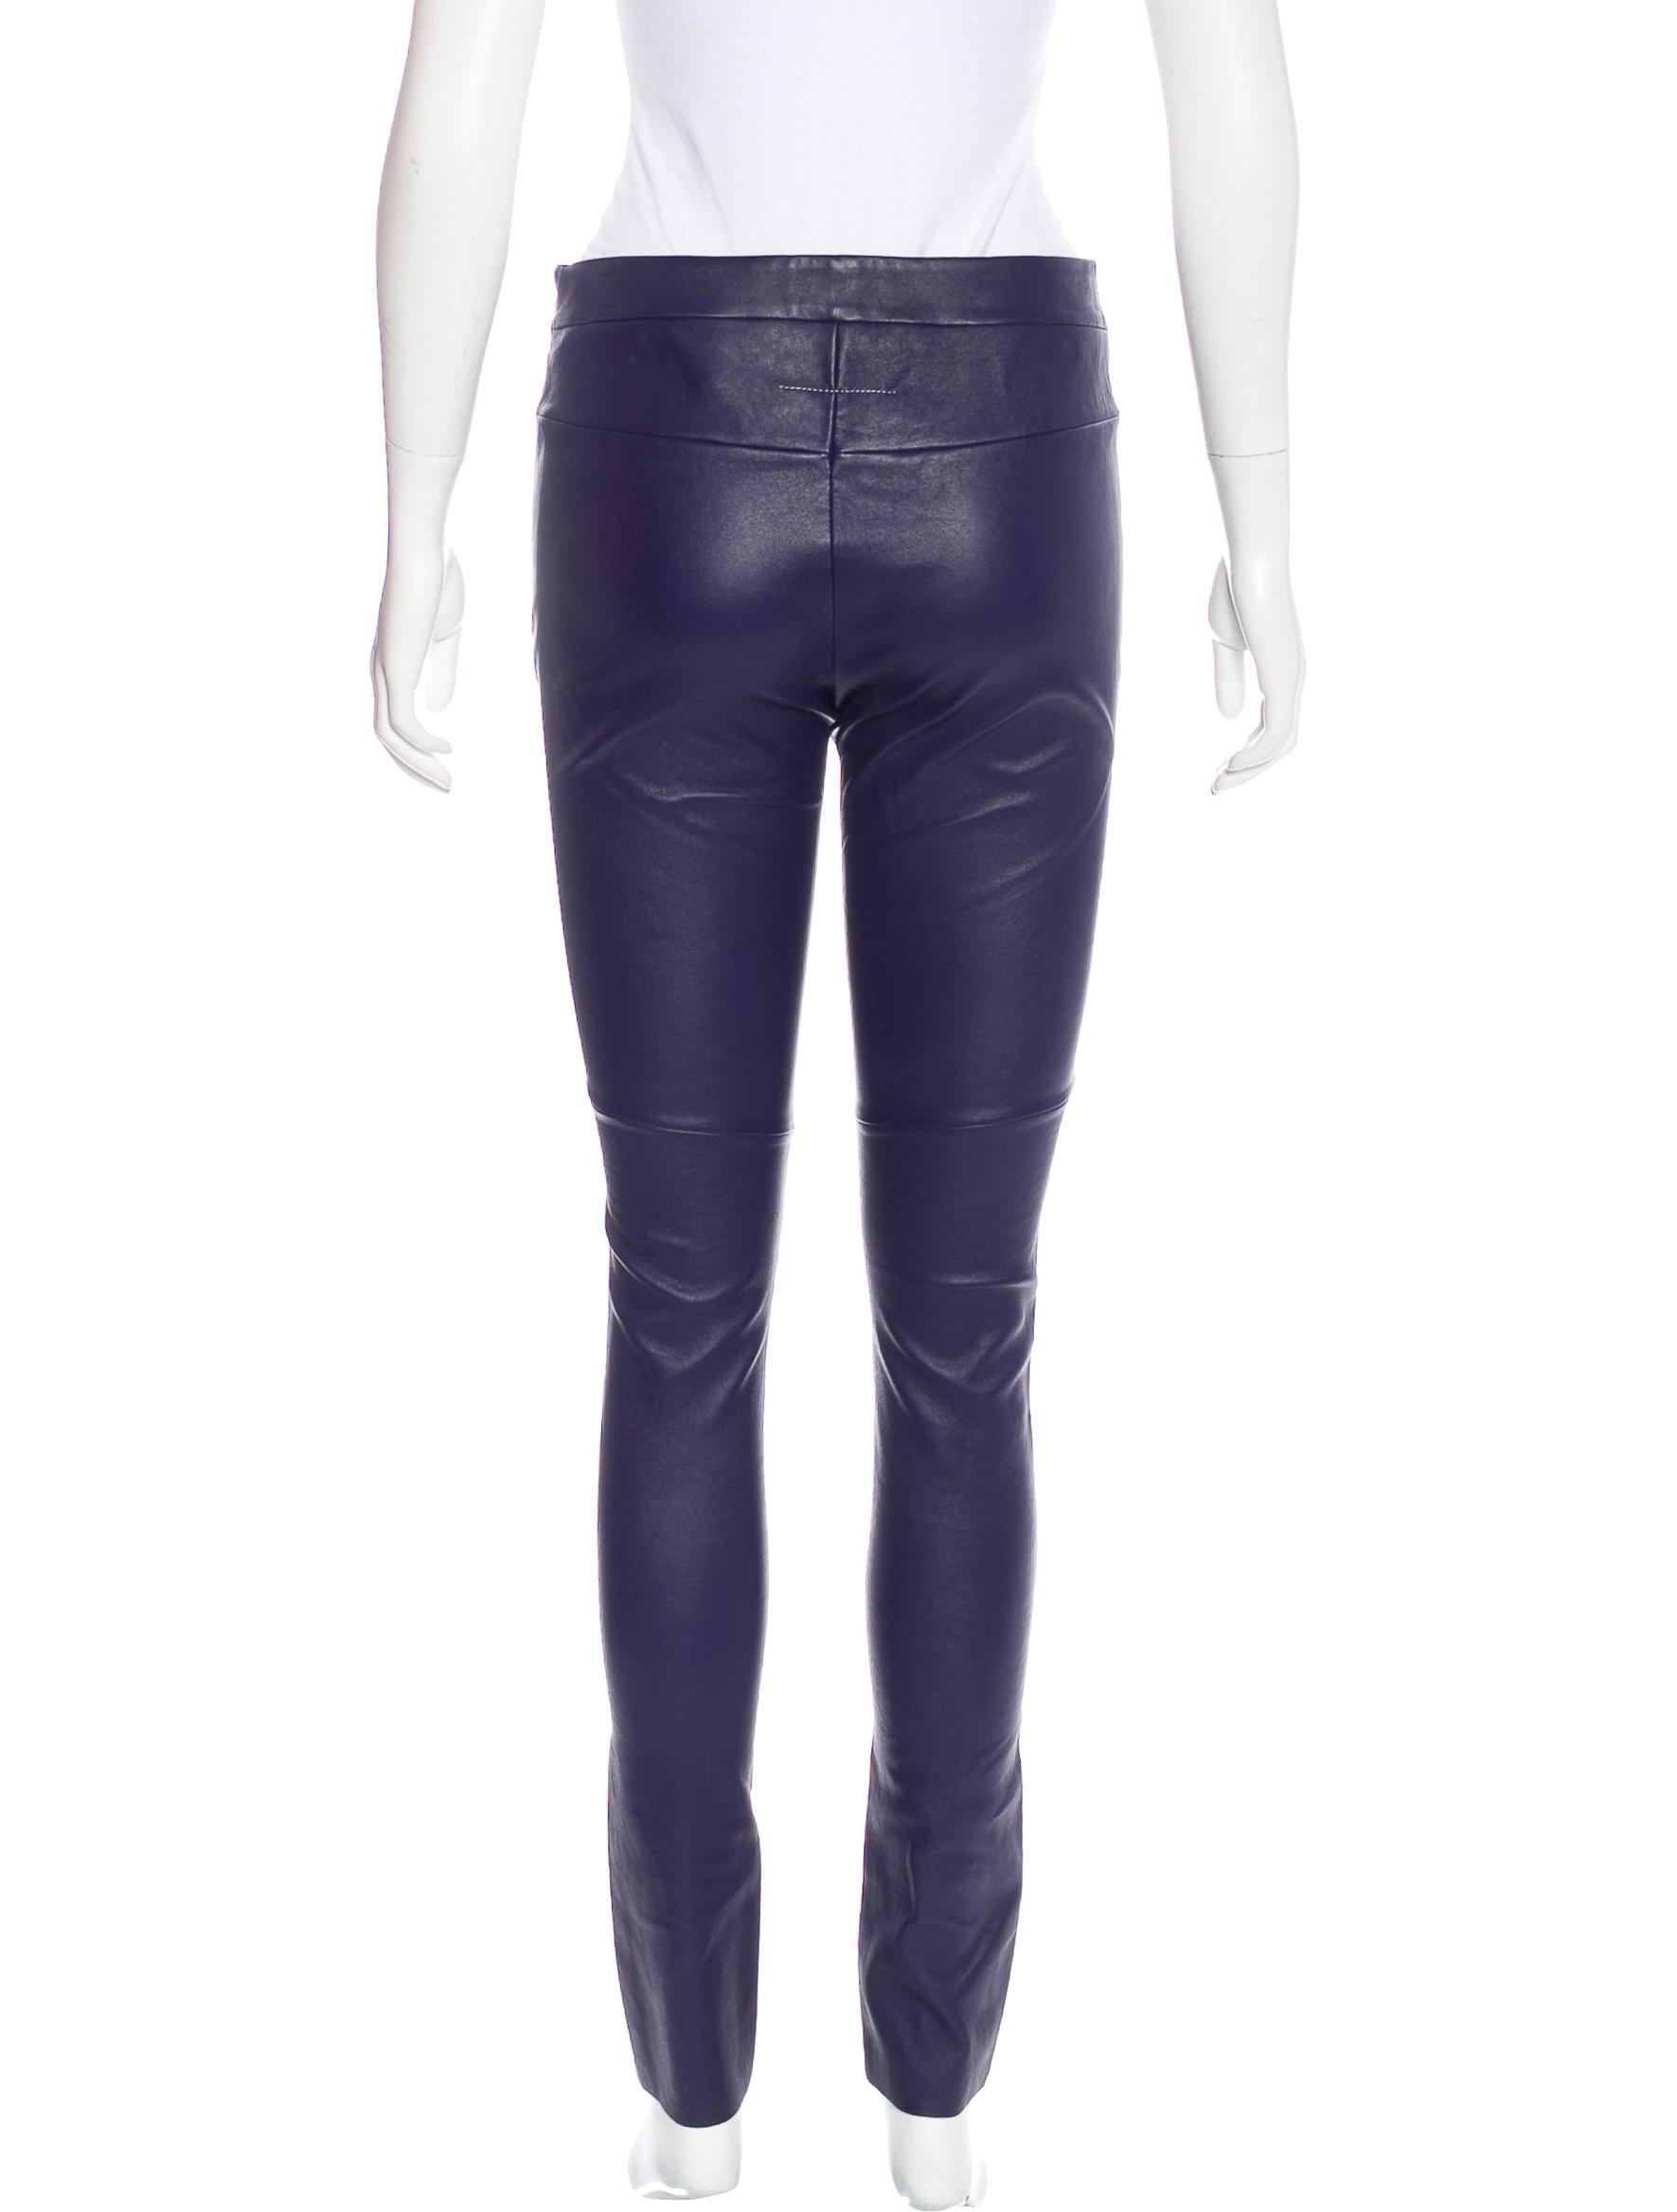 Mm6 by maison martin margiela mid rise leather leggings for 10 moulmein rise la maison